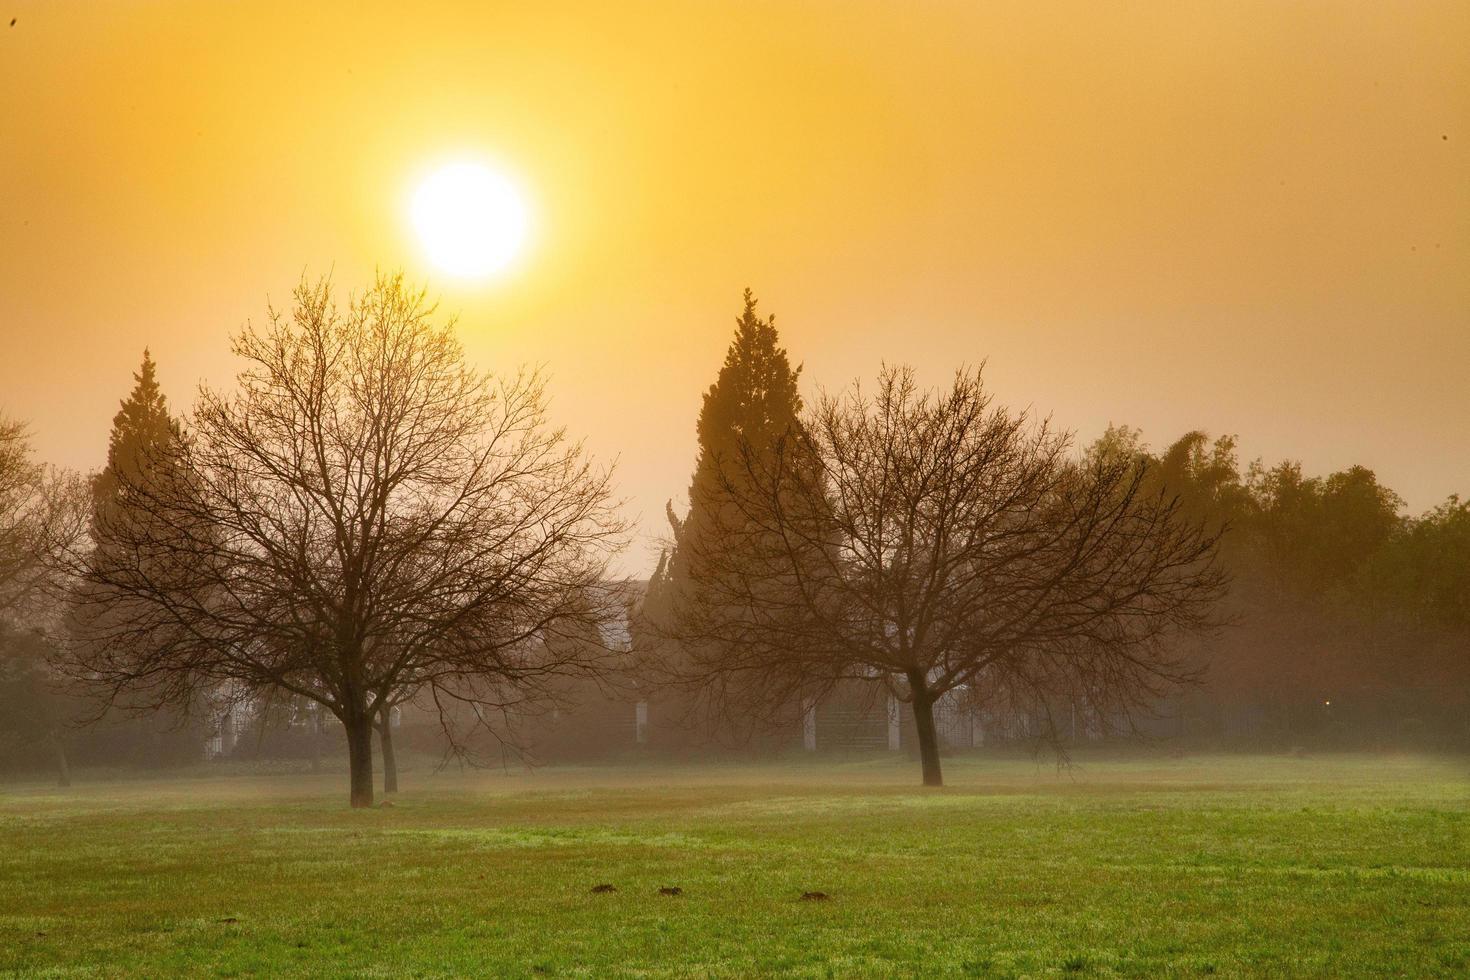 mistig veld bij zonsondergang foto